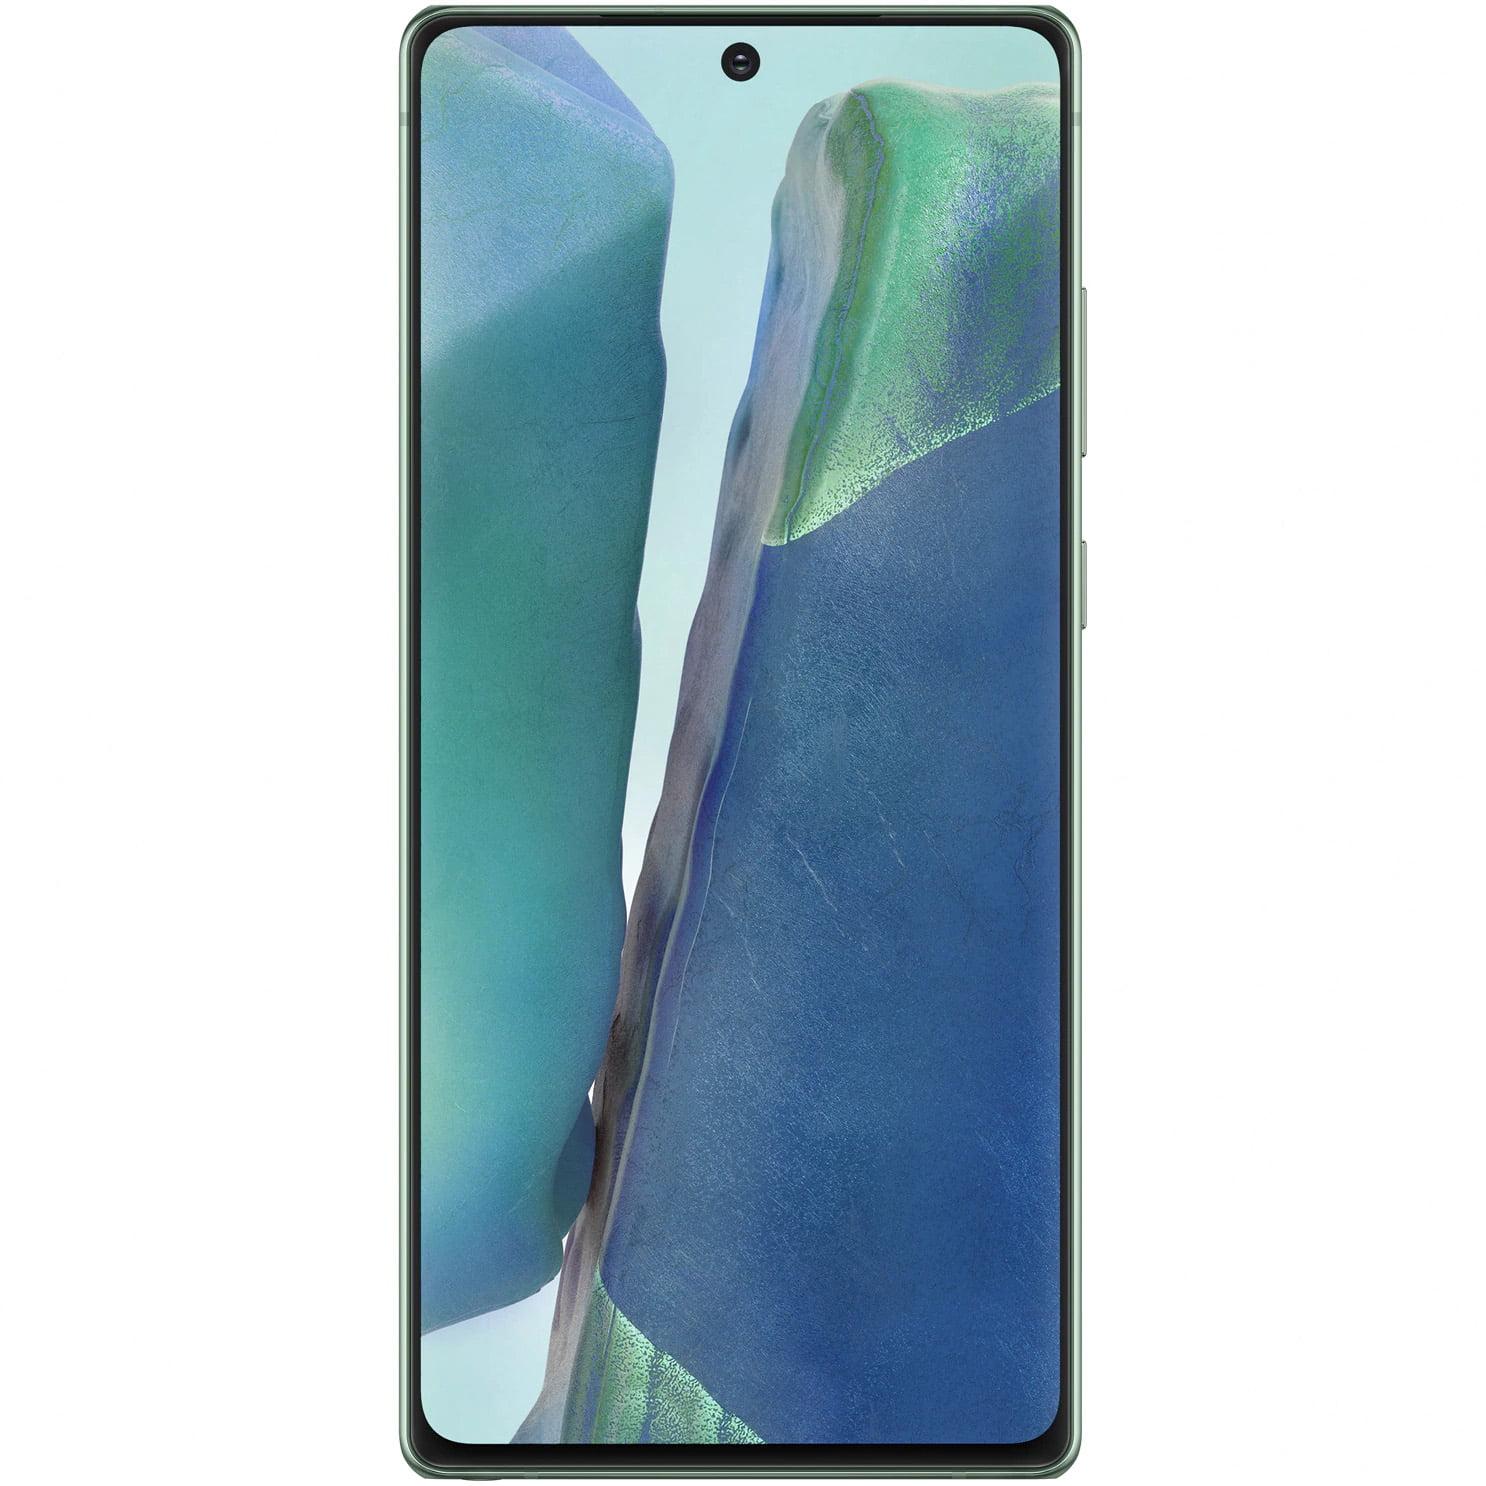 Telefon mobil Samsung Galaxy Note 20, Dual SIM, 256GB, 8GB RAM, 5G, Mystic Green